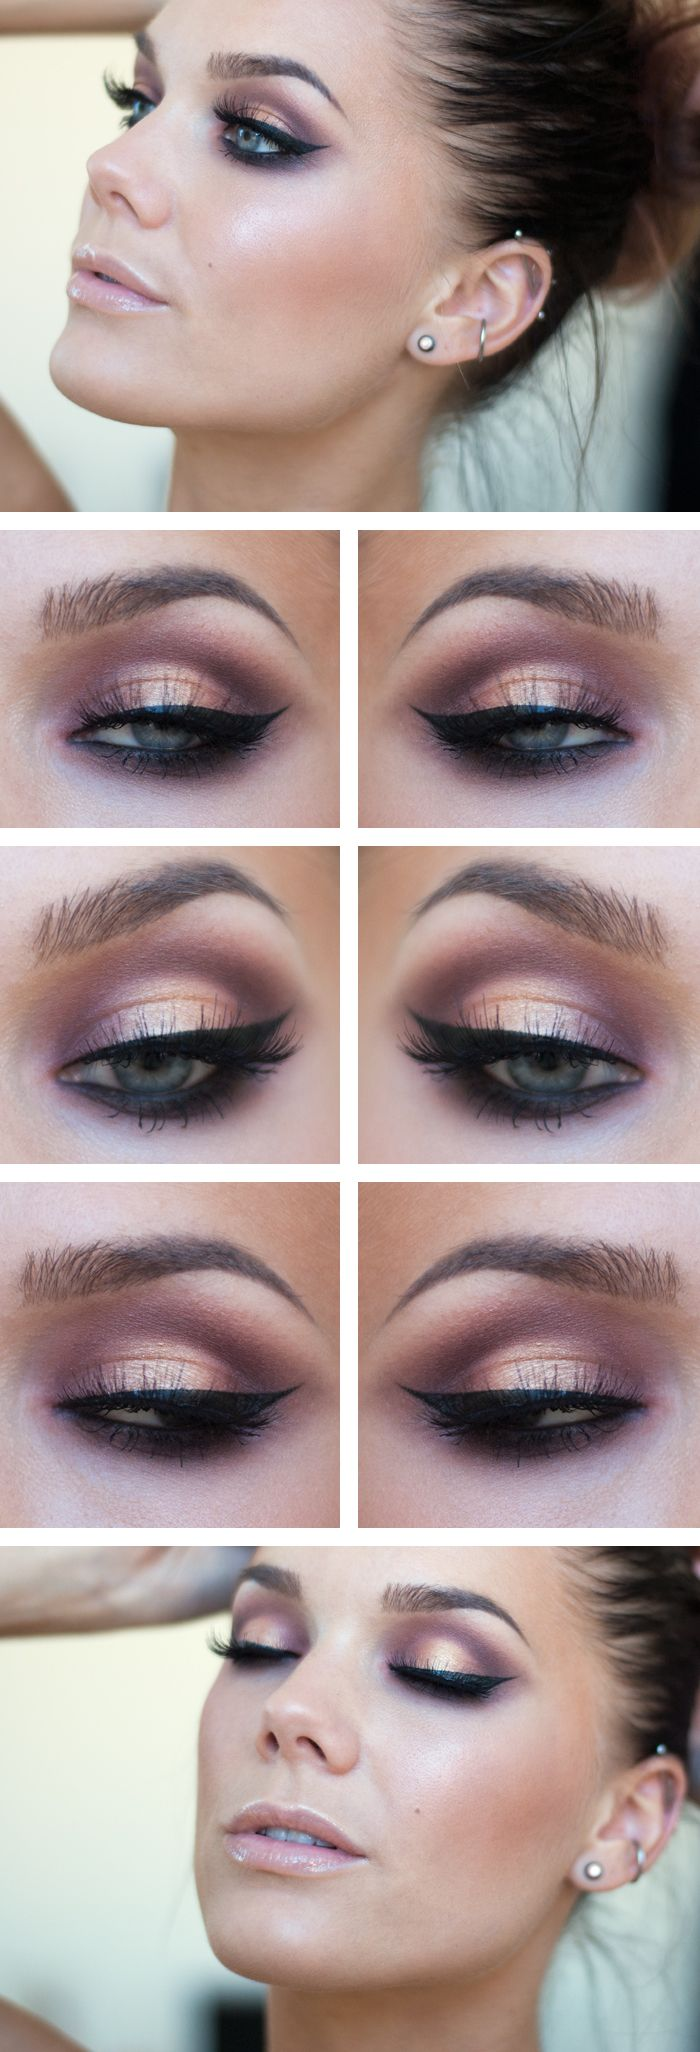 #eyeshadow #makeup #beauty #inspiration #smokey #glameyes